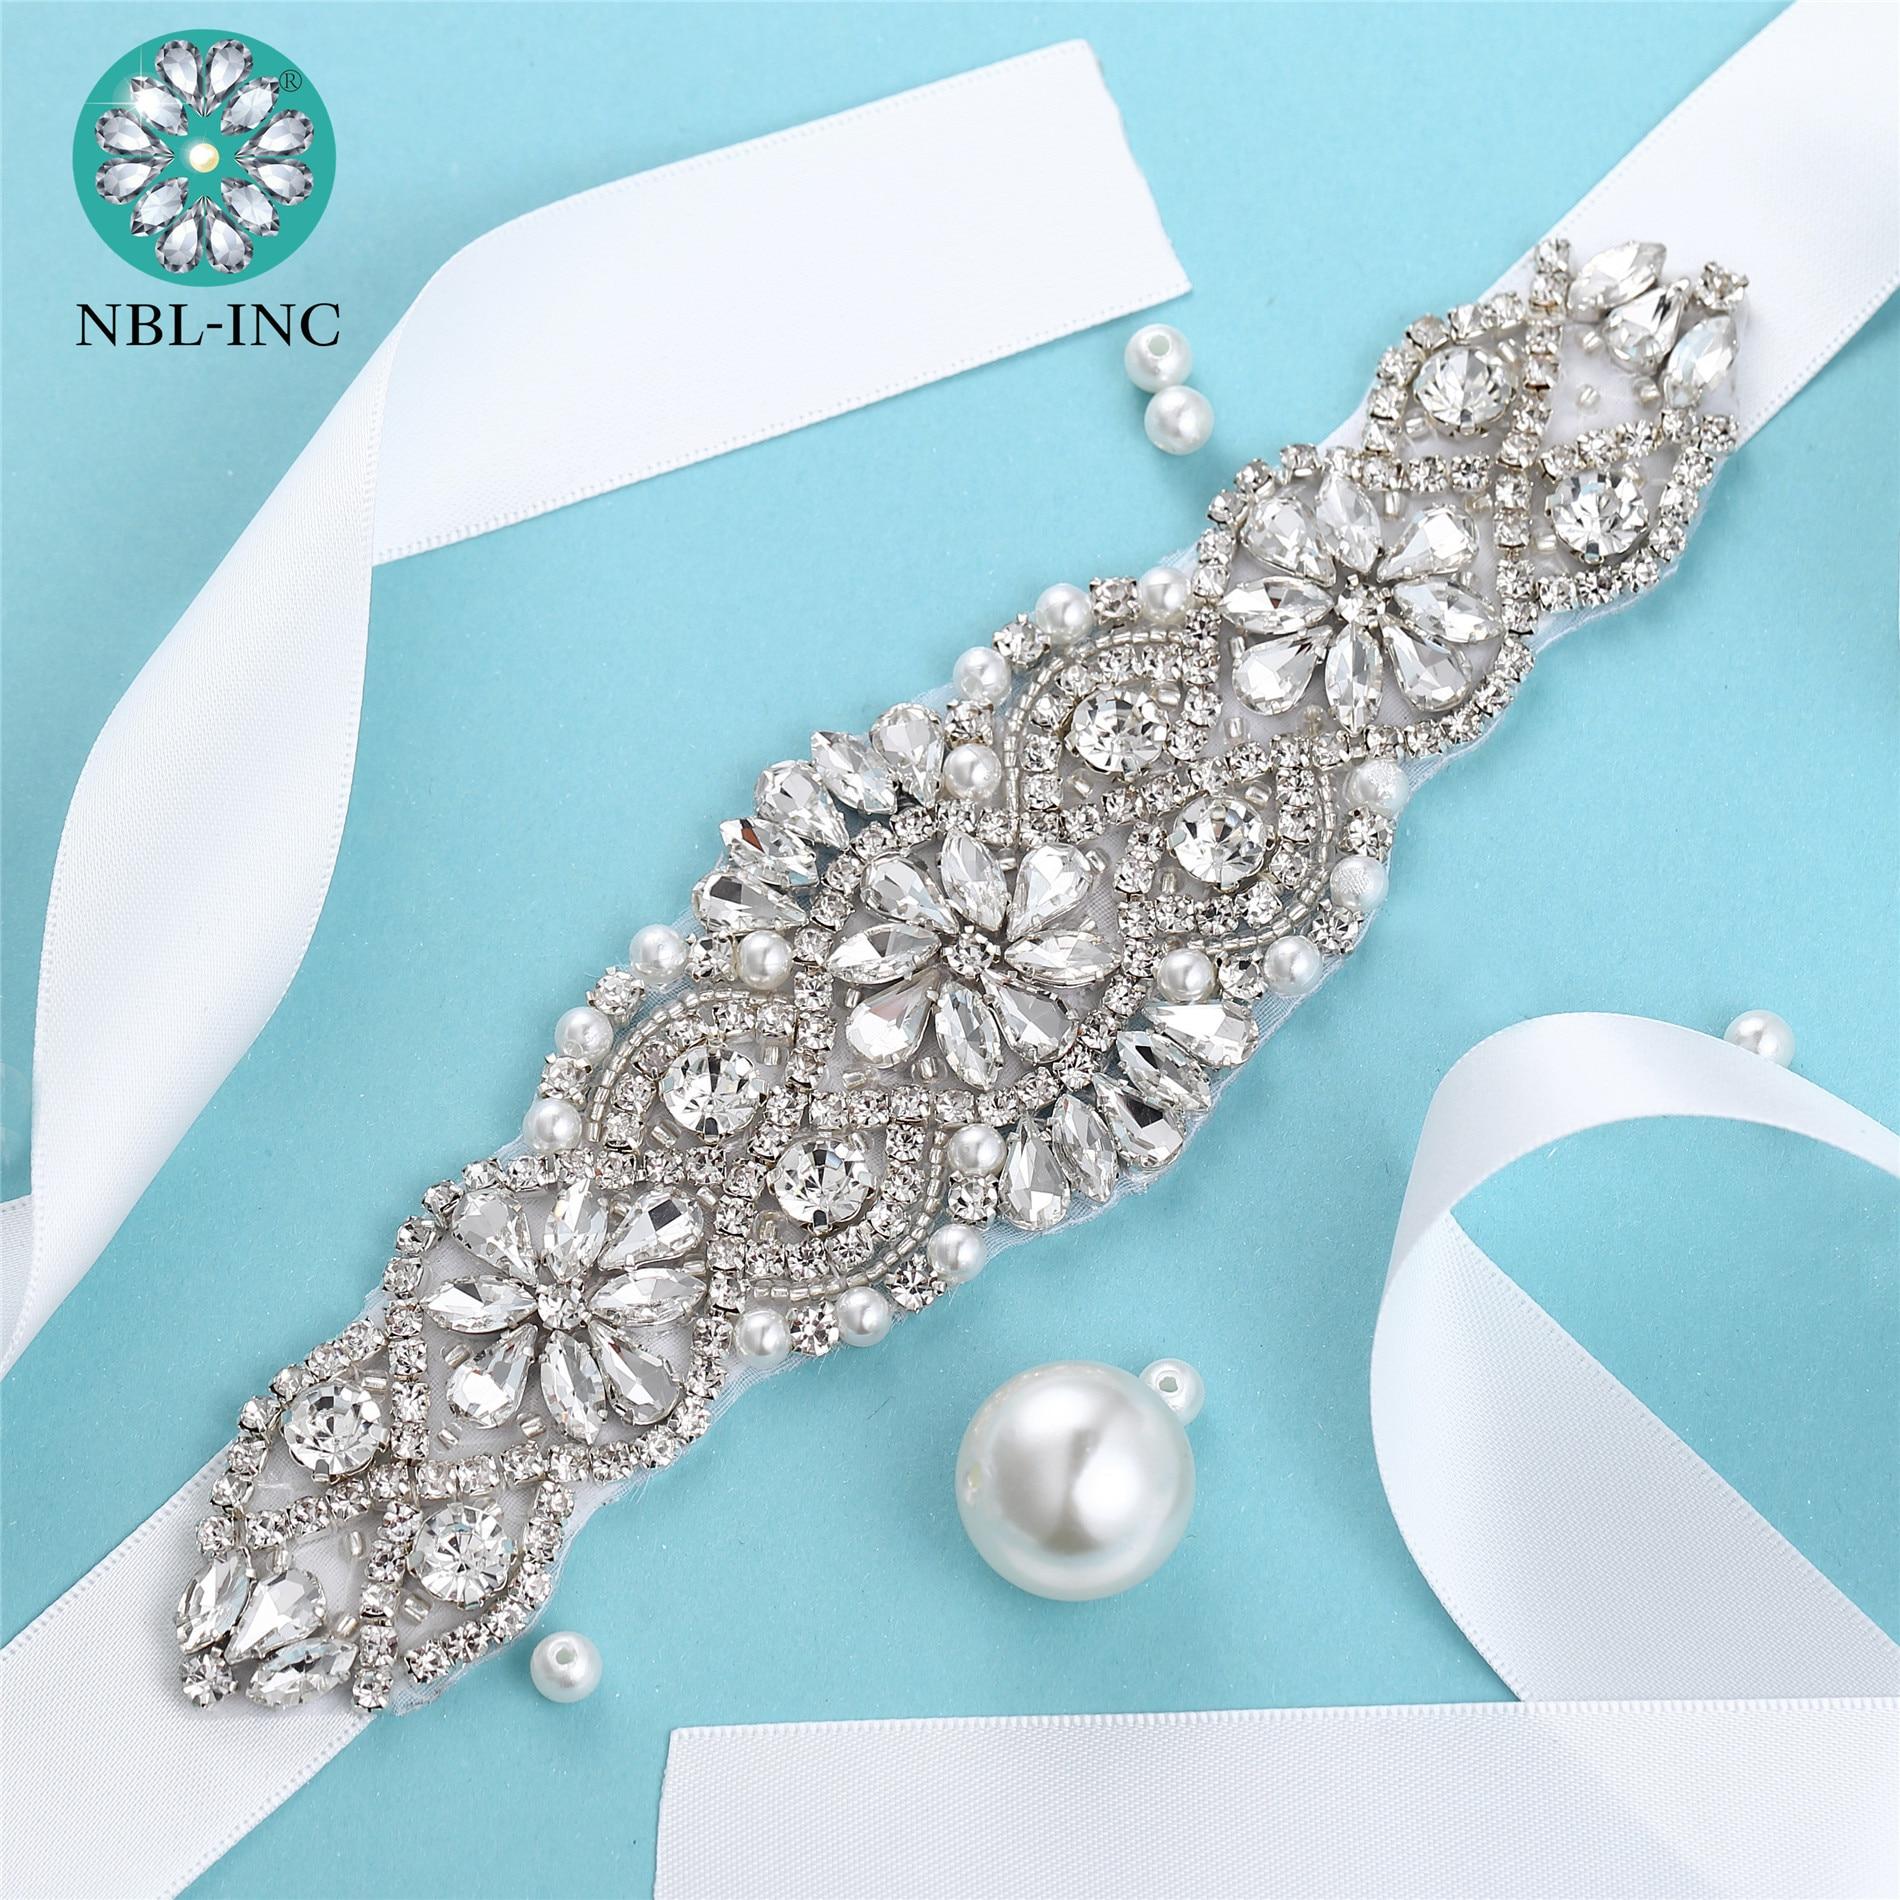 (1PC) Rhinestone bridal belt diamond wedding dress belt crystal wedding sash for wedding dress accessories WDD1041